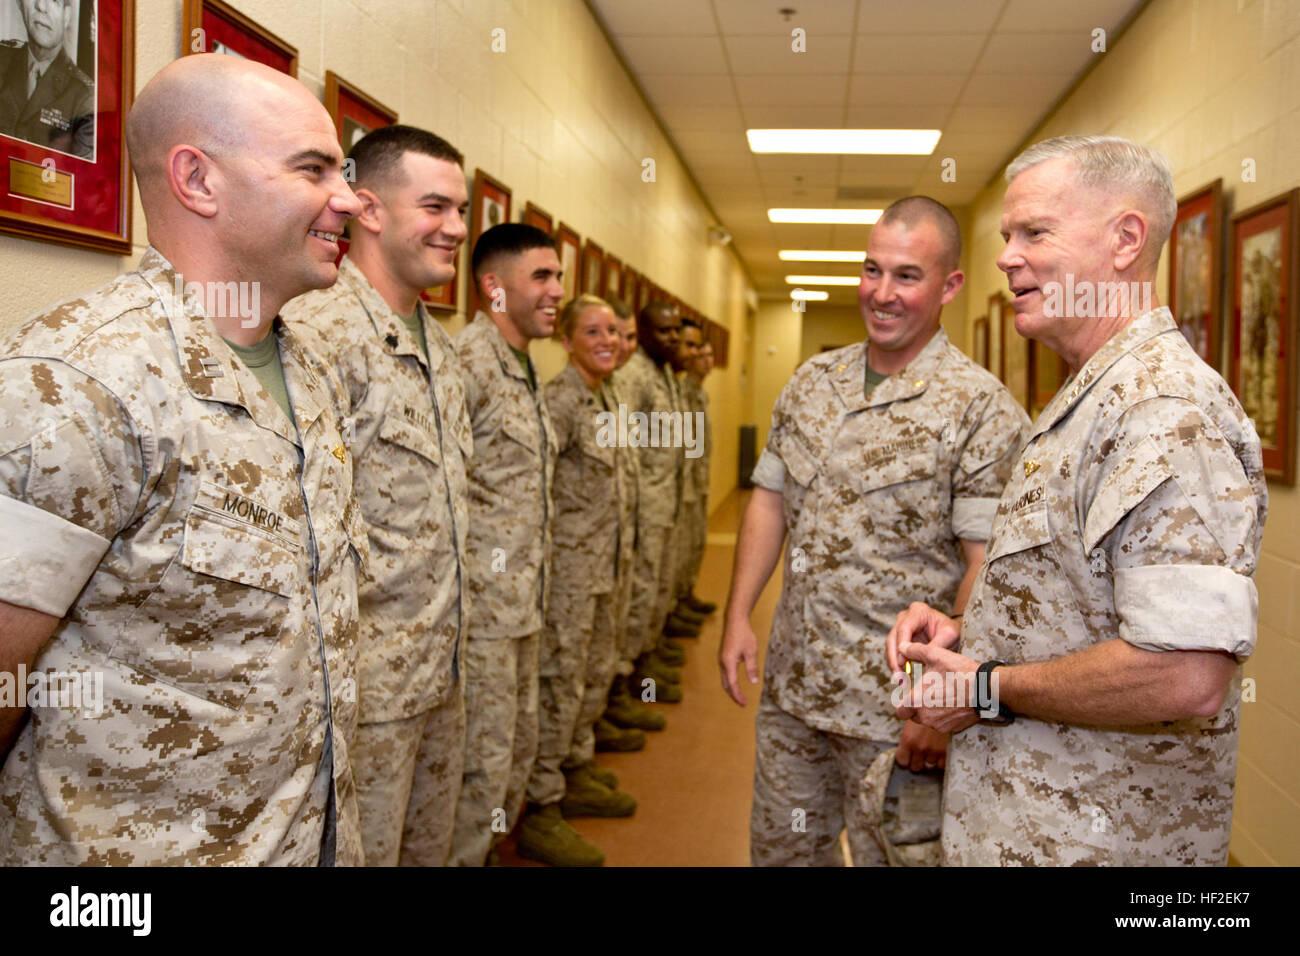 U.S. Marine Corps Maj. Matthew F. McDonald, center right, company commander, introduces Capt. Robert Monroe, left, Stock Photo